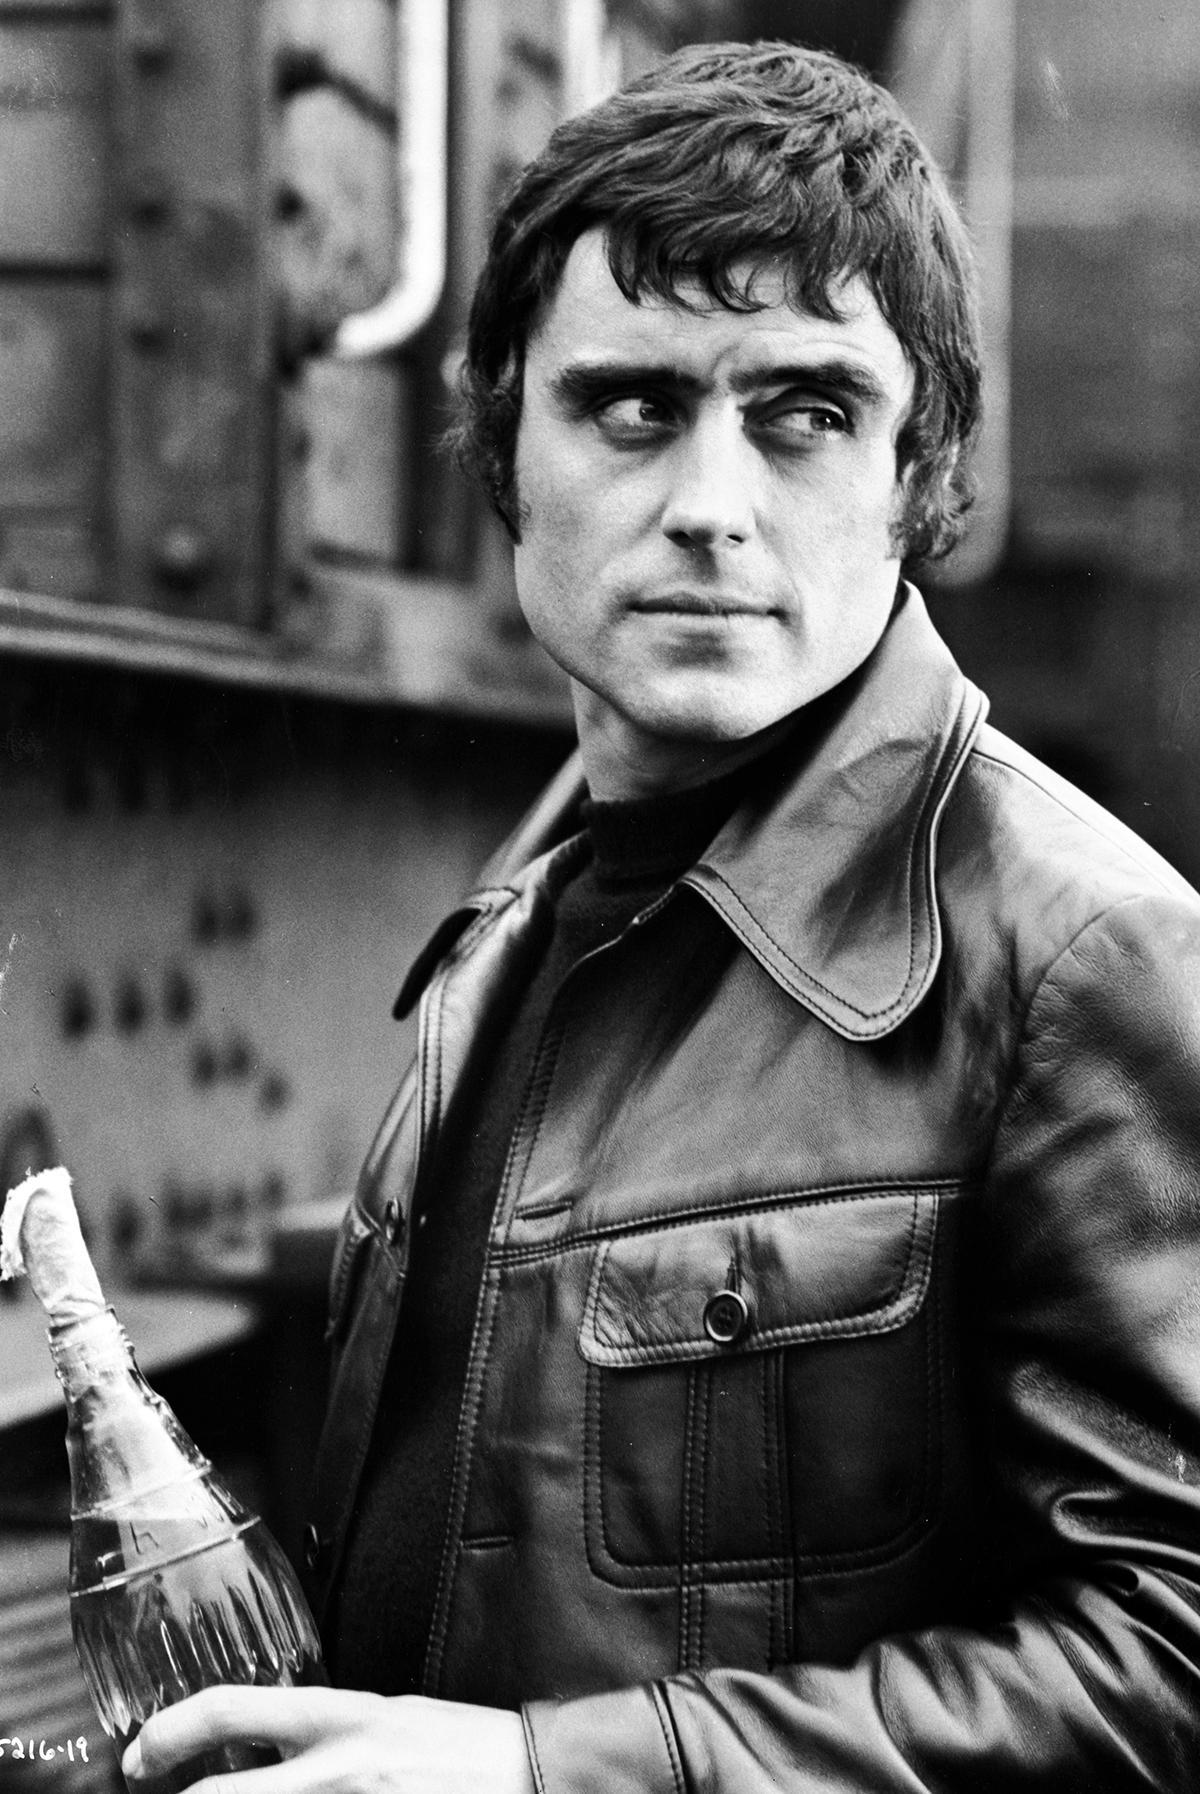 Ian McShane in Sitting Target (1972)